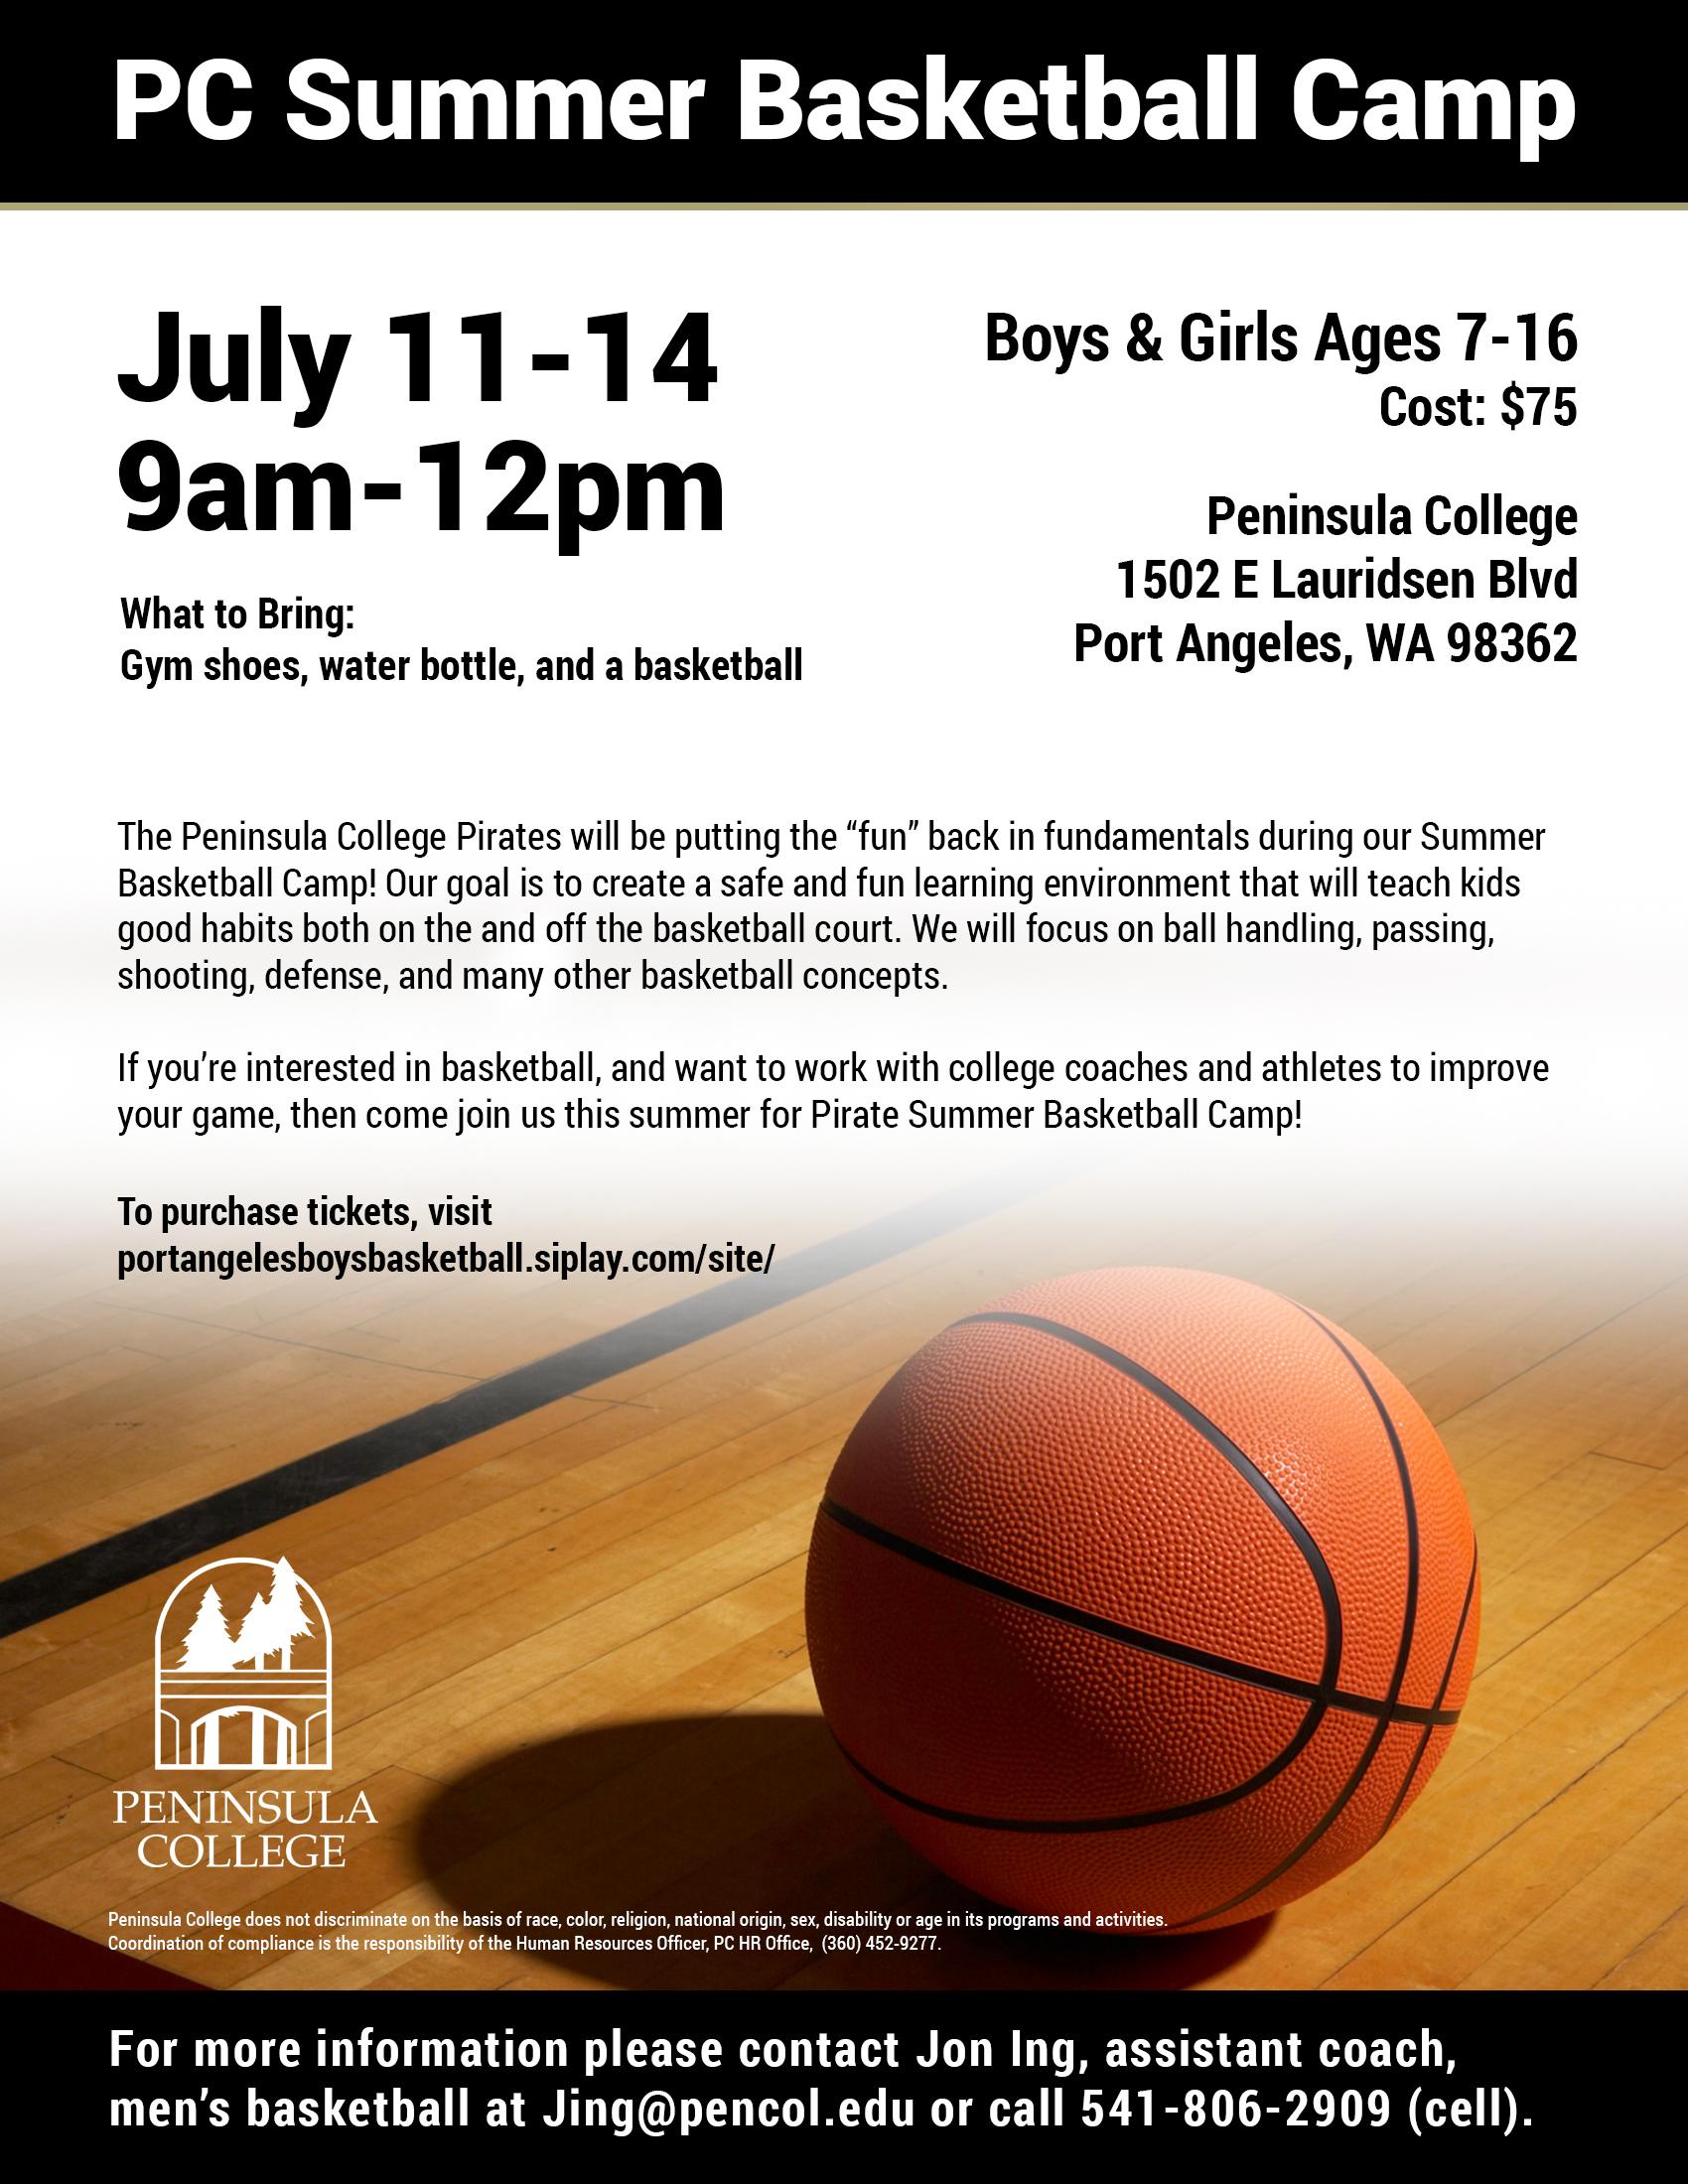 2016 Summer Basketball Camp